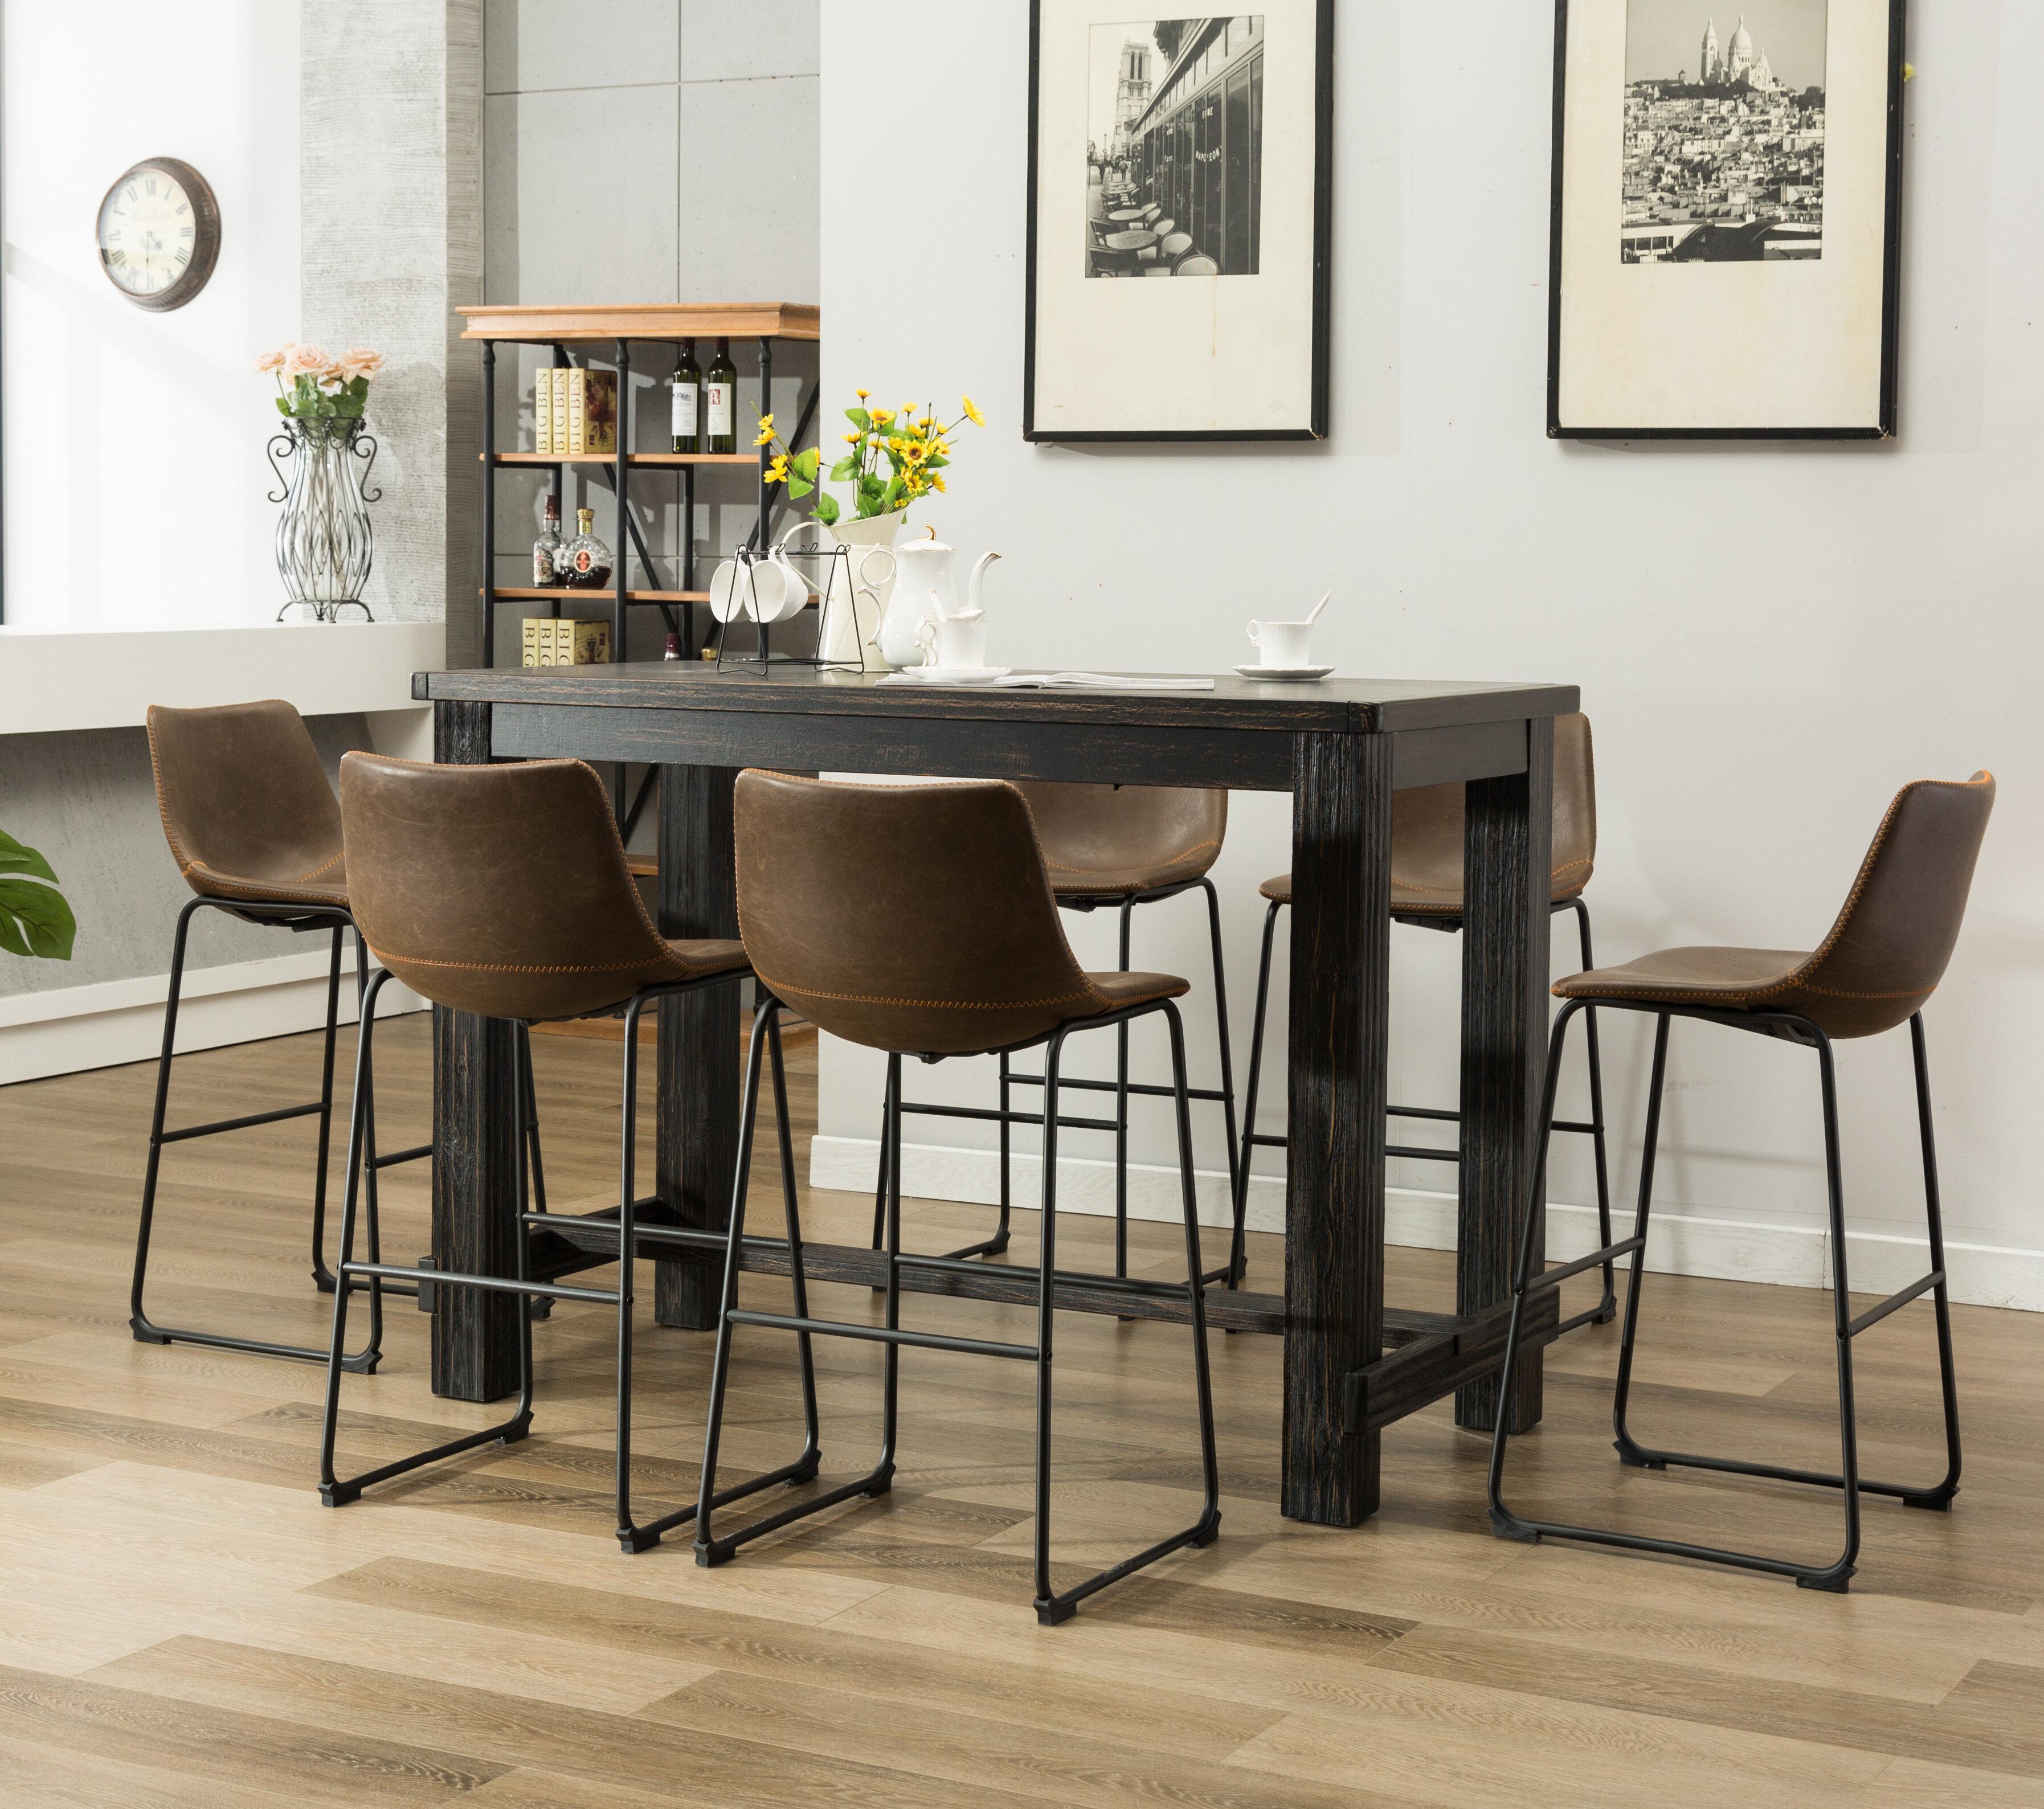 7 Piece Bar Height Rubberwood Solid Wood Dining Set Reviews Joss Main